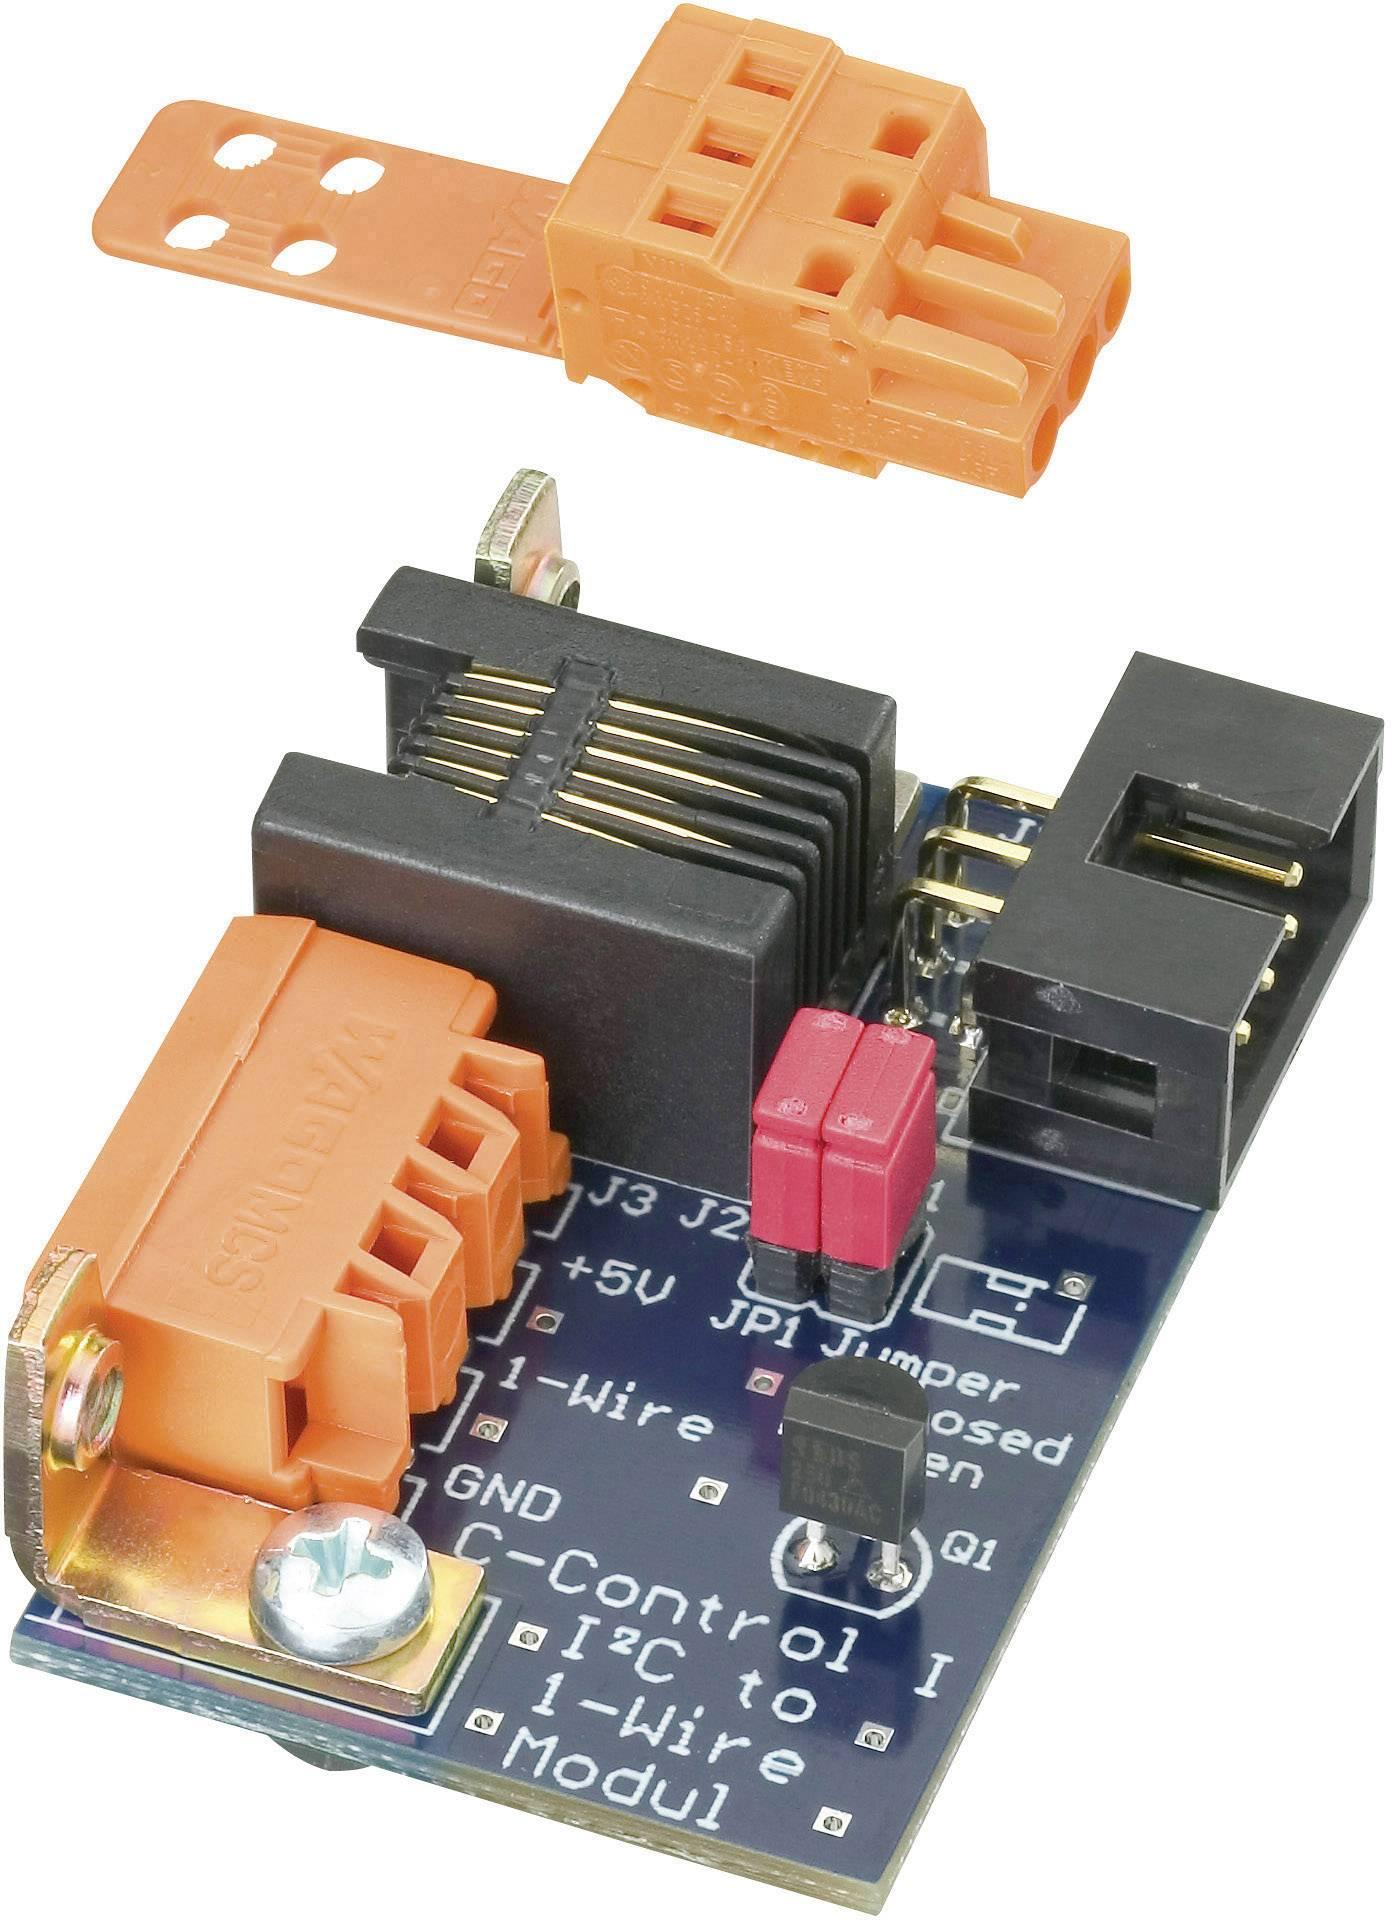 I²C konvertor C-Control 1-Wire modul